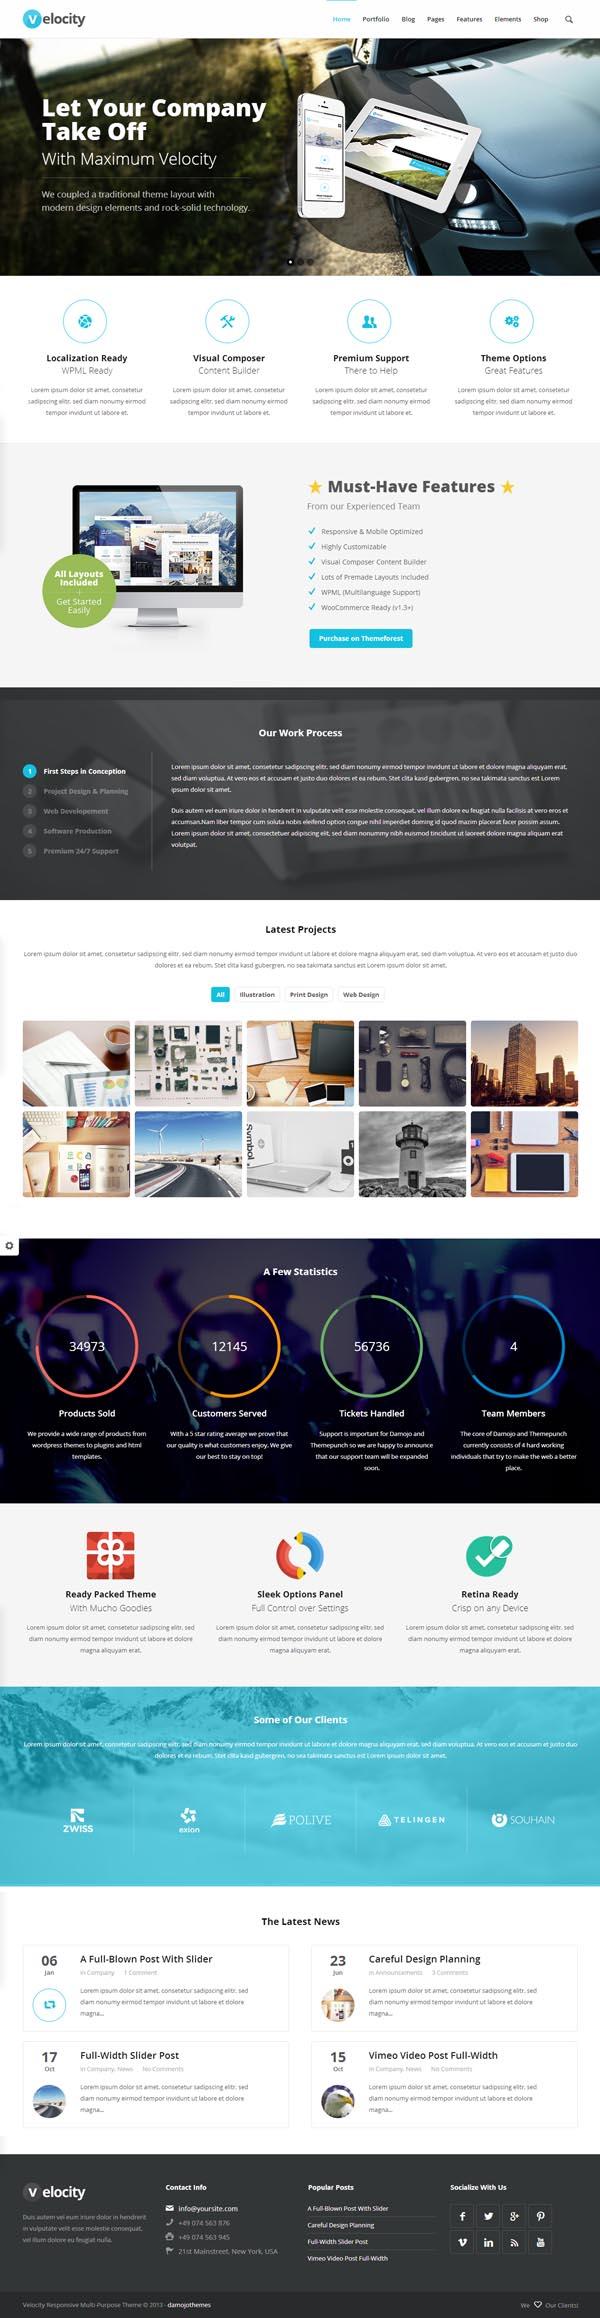 Velocity – Responsive Multi-Purpose WordPress Theme